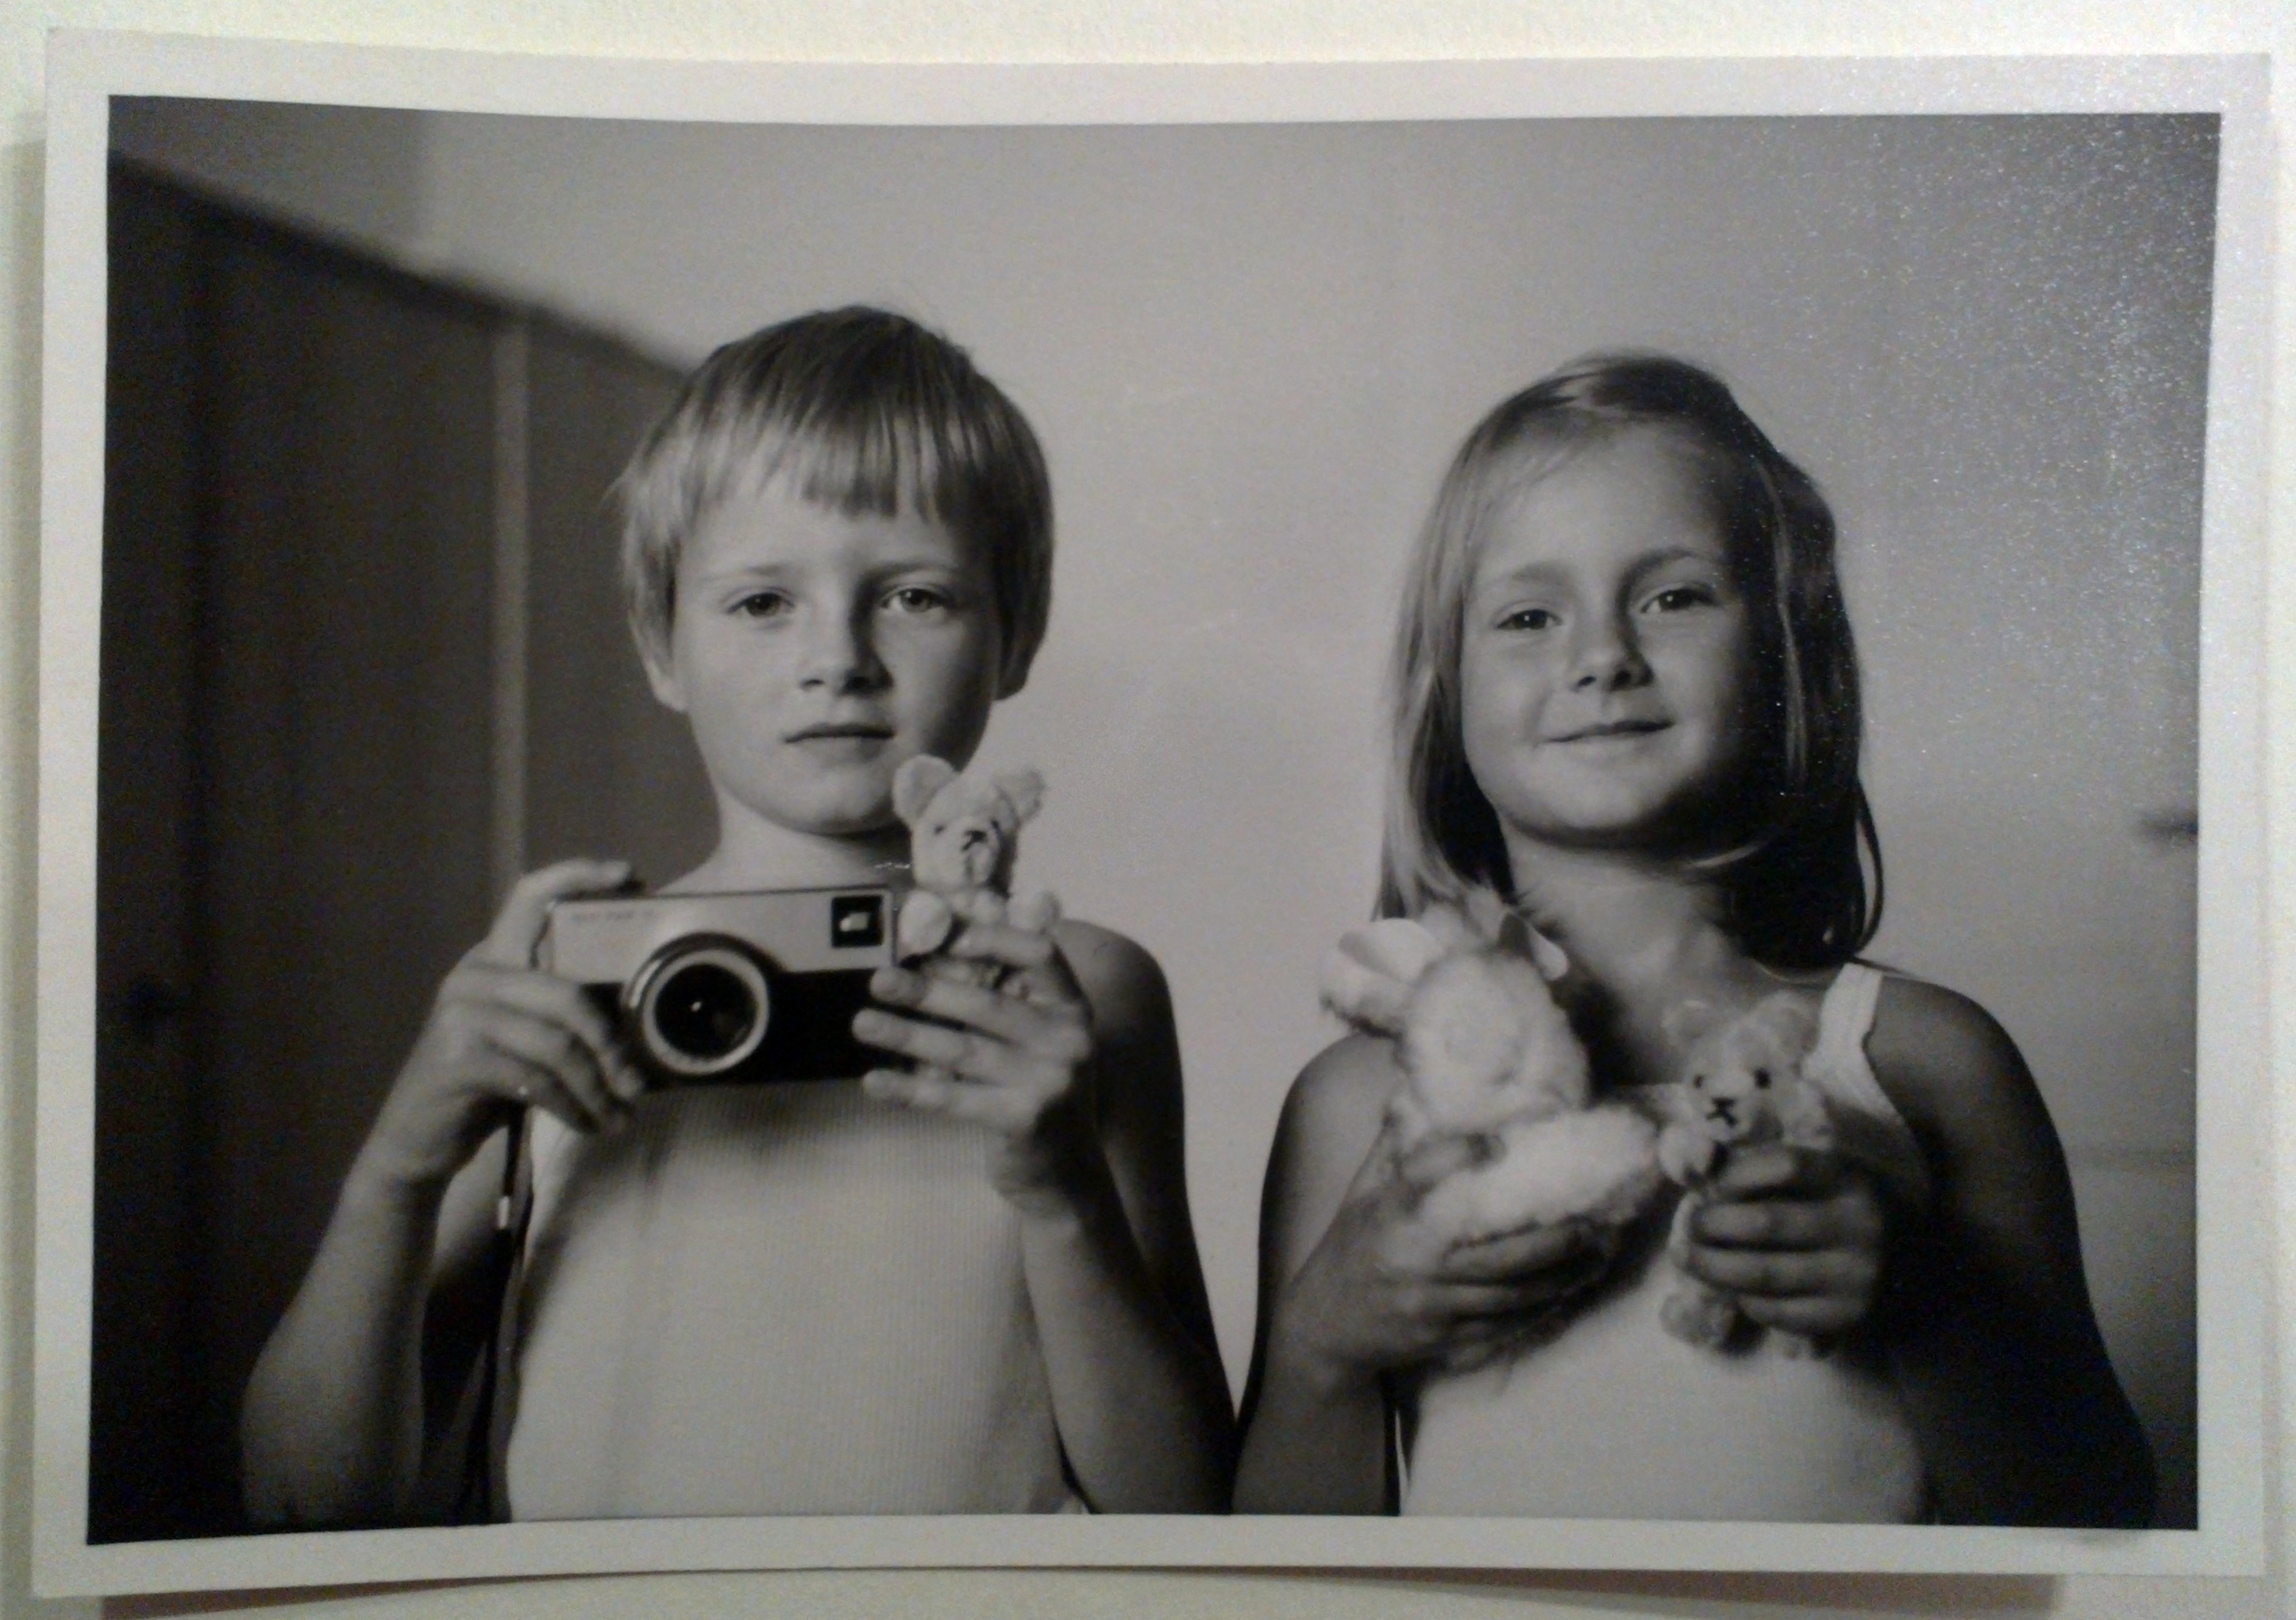 Kodak Instamatik